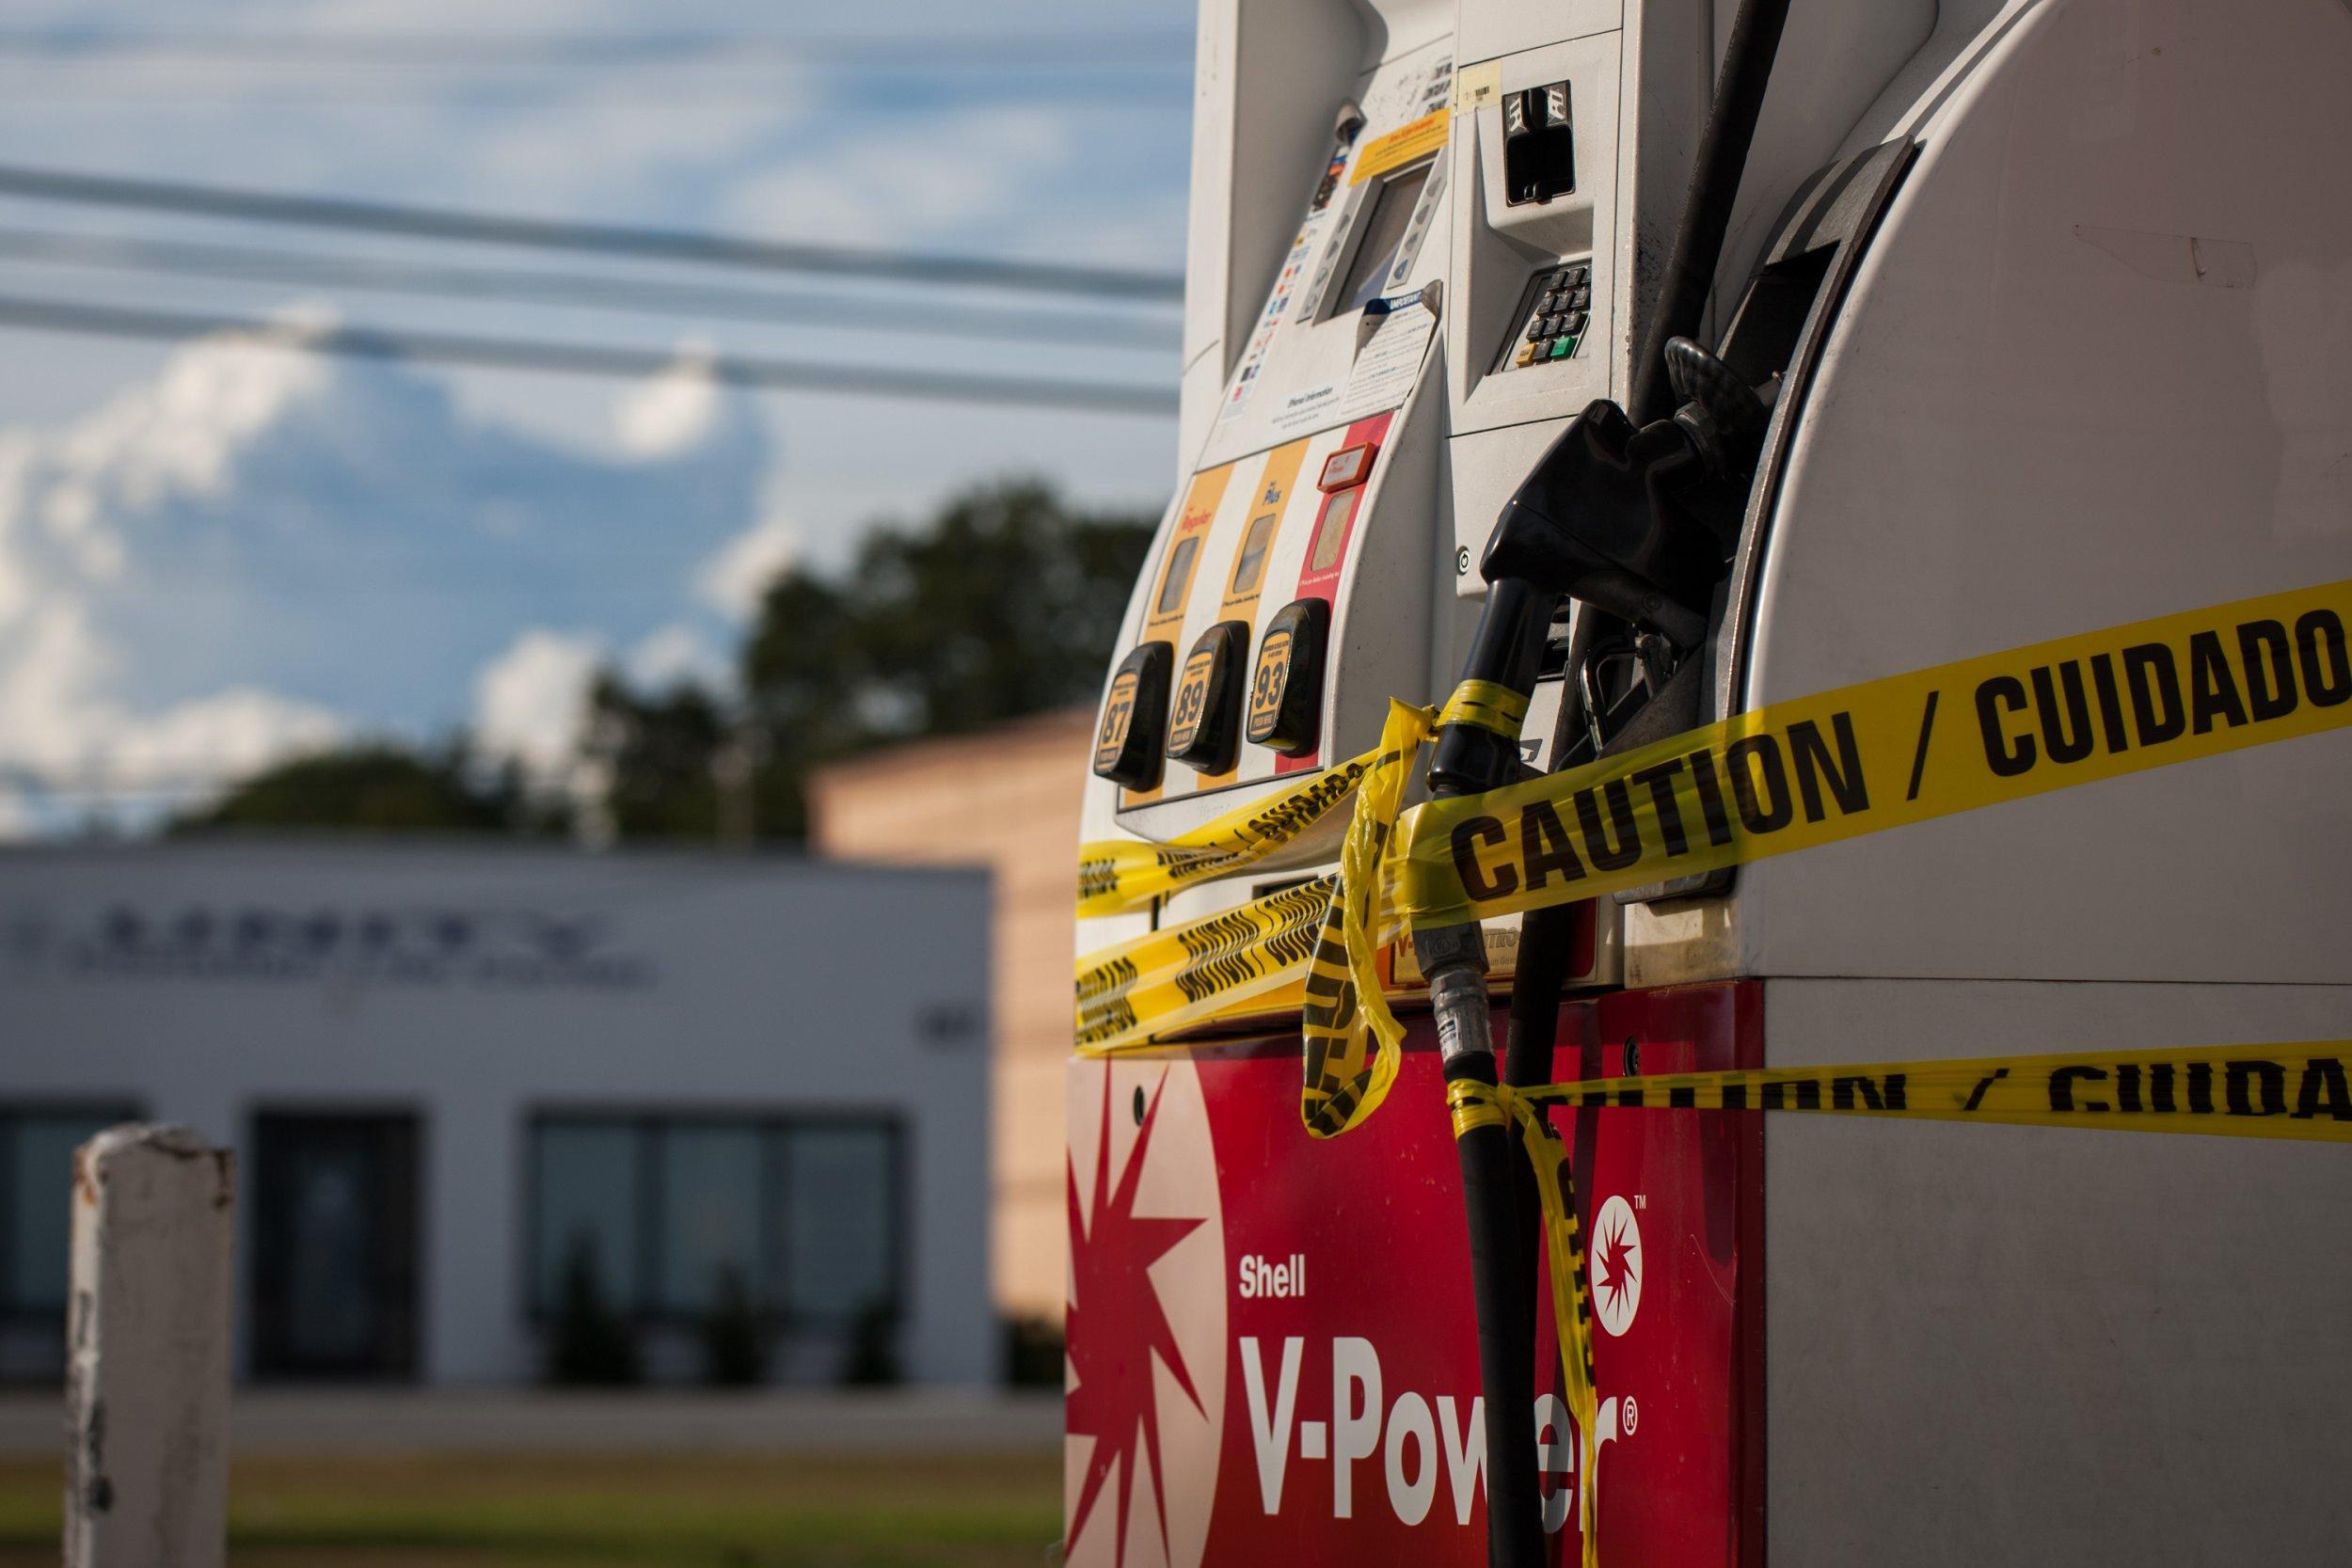 Gas Station Caution